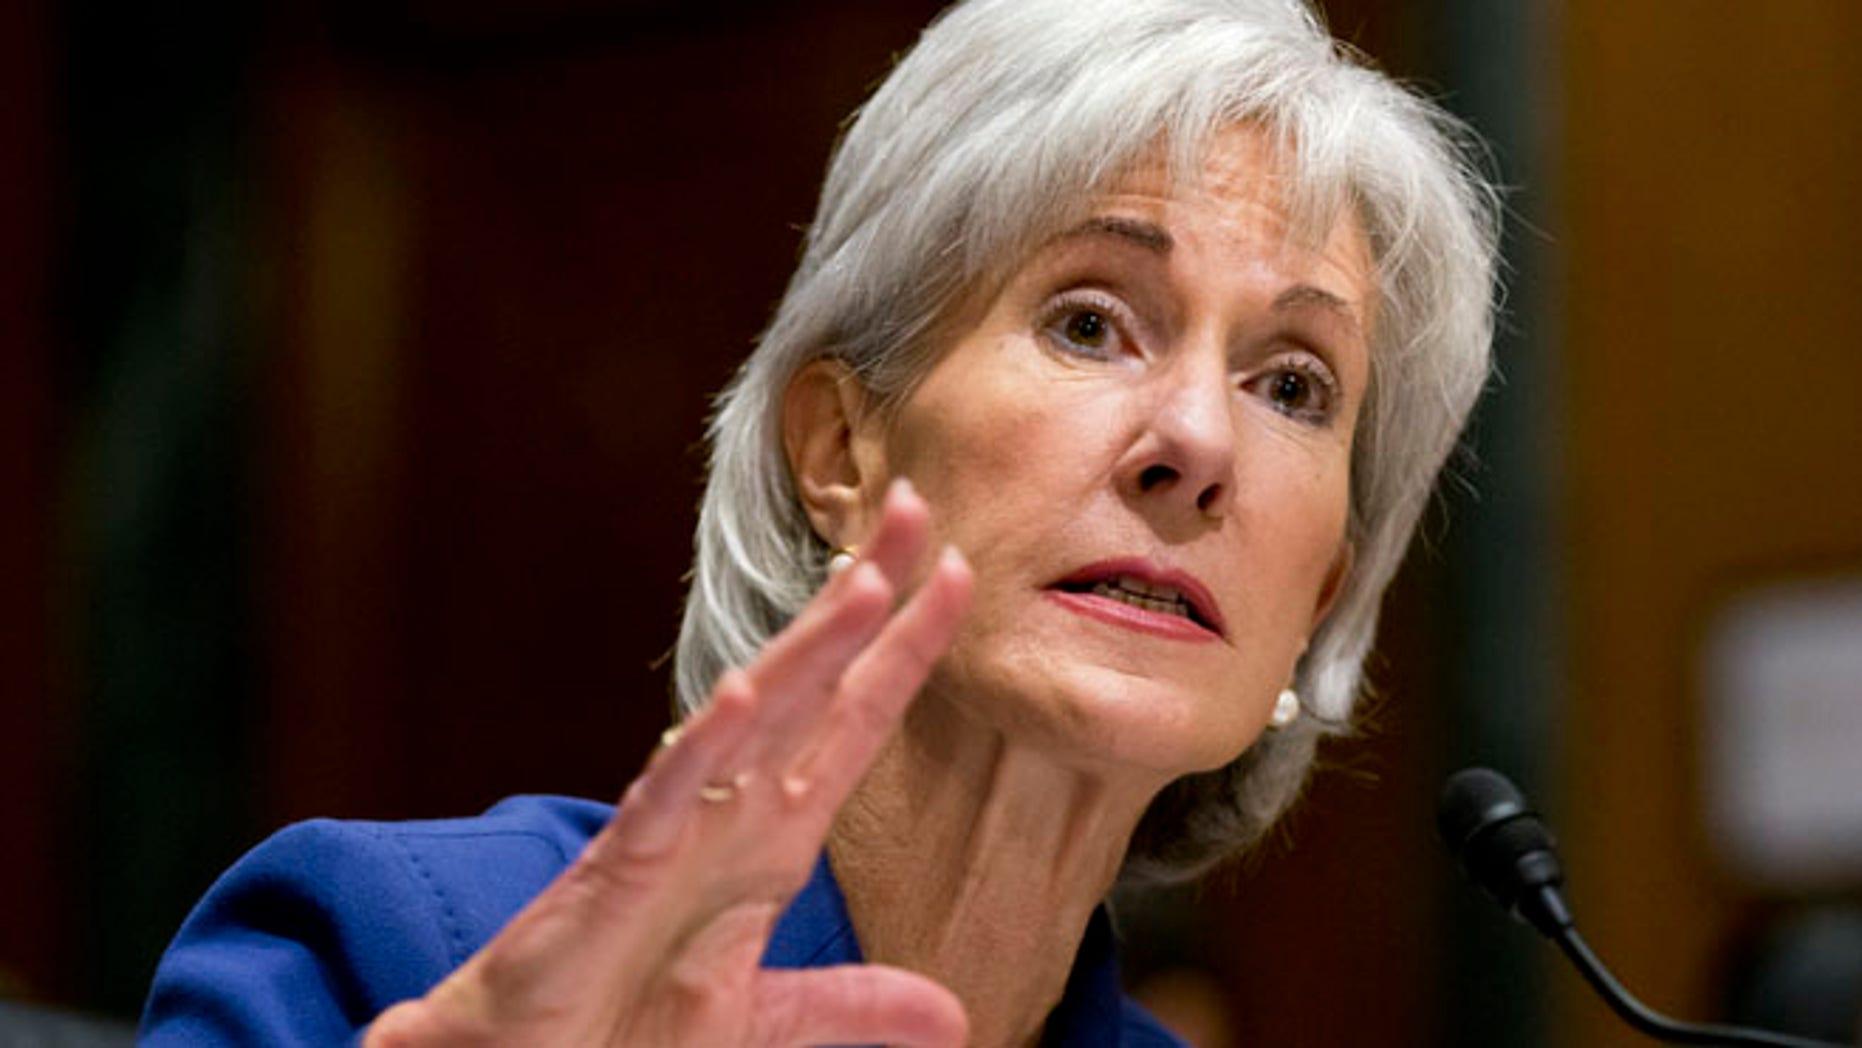 Health and Human Services Secretary Kathleen Sebelius testifies on Capitol Hill in Washington, Wednesday, Nov. 6, 2013